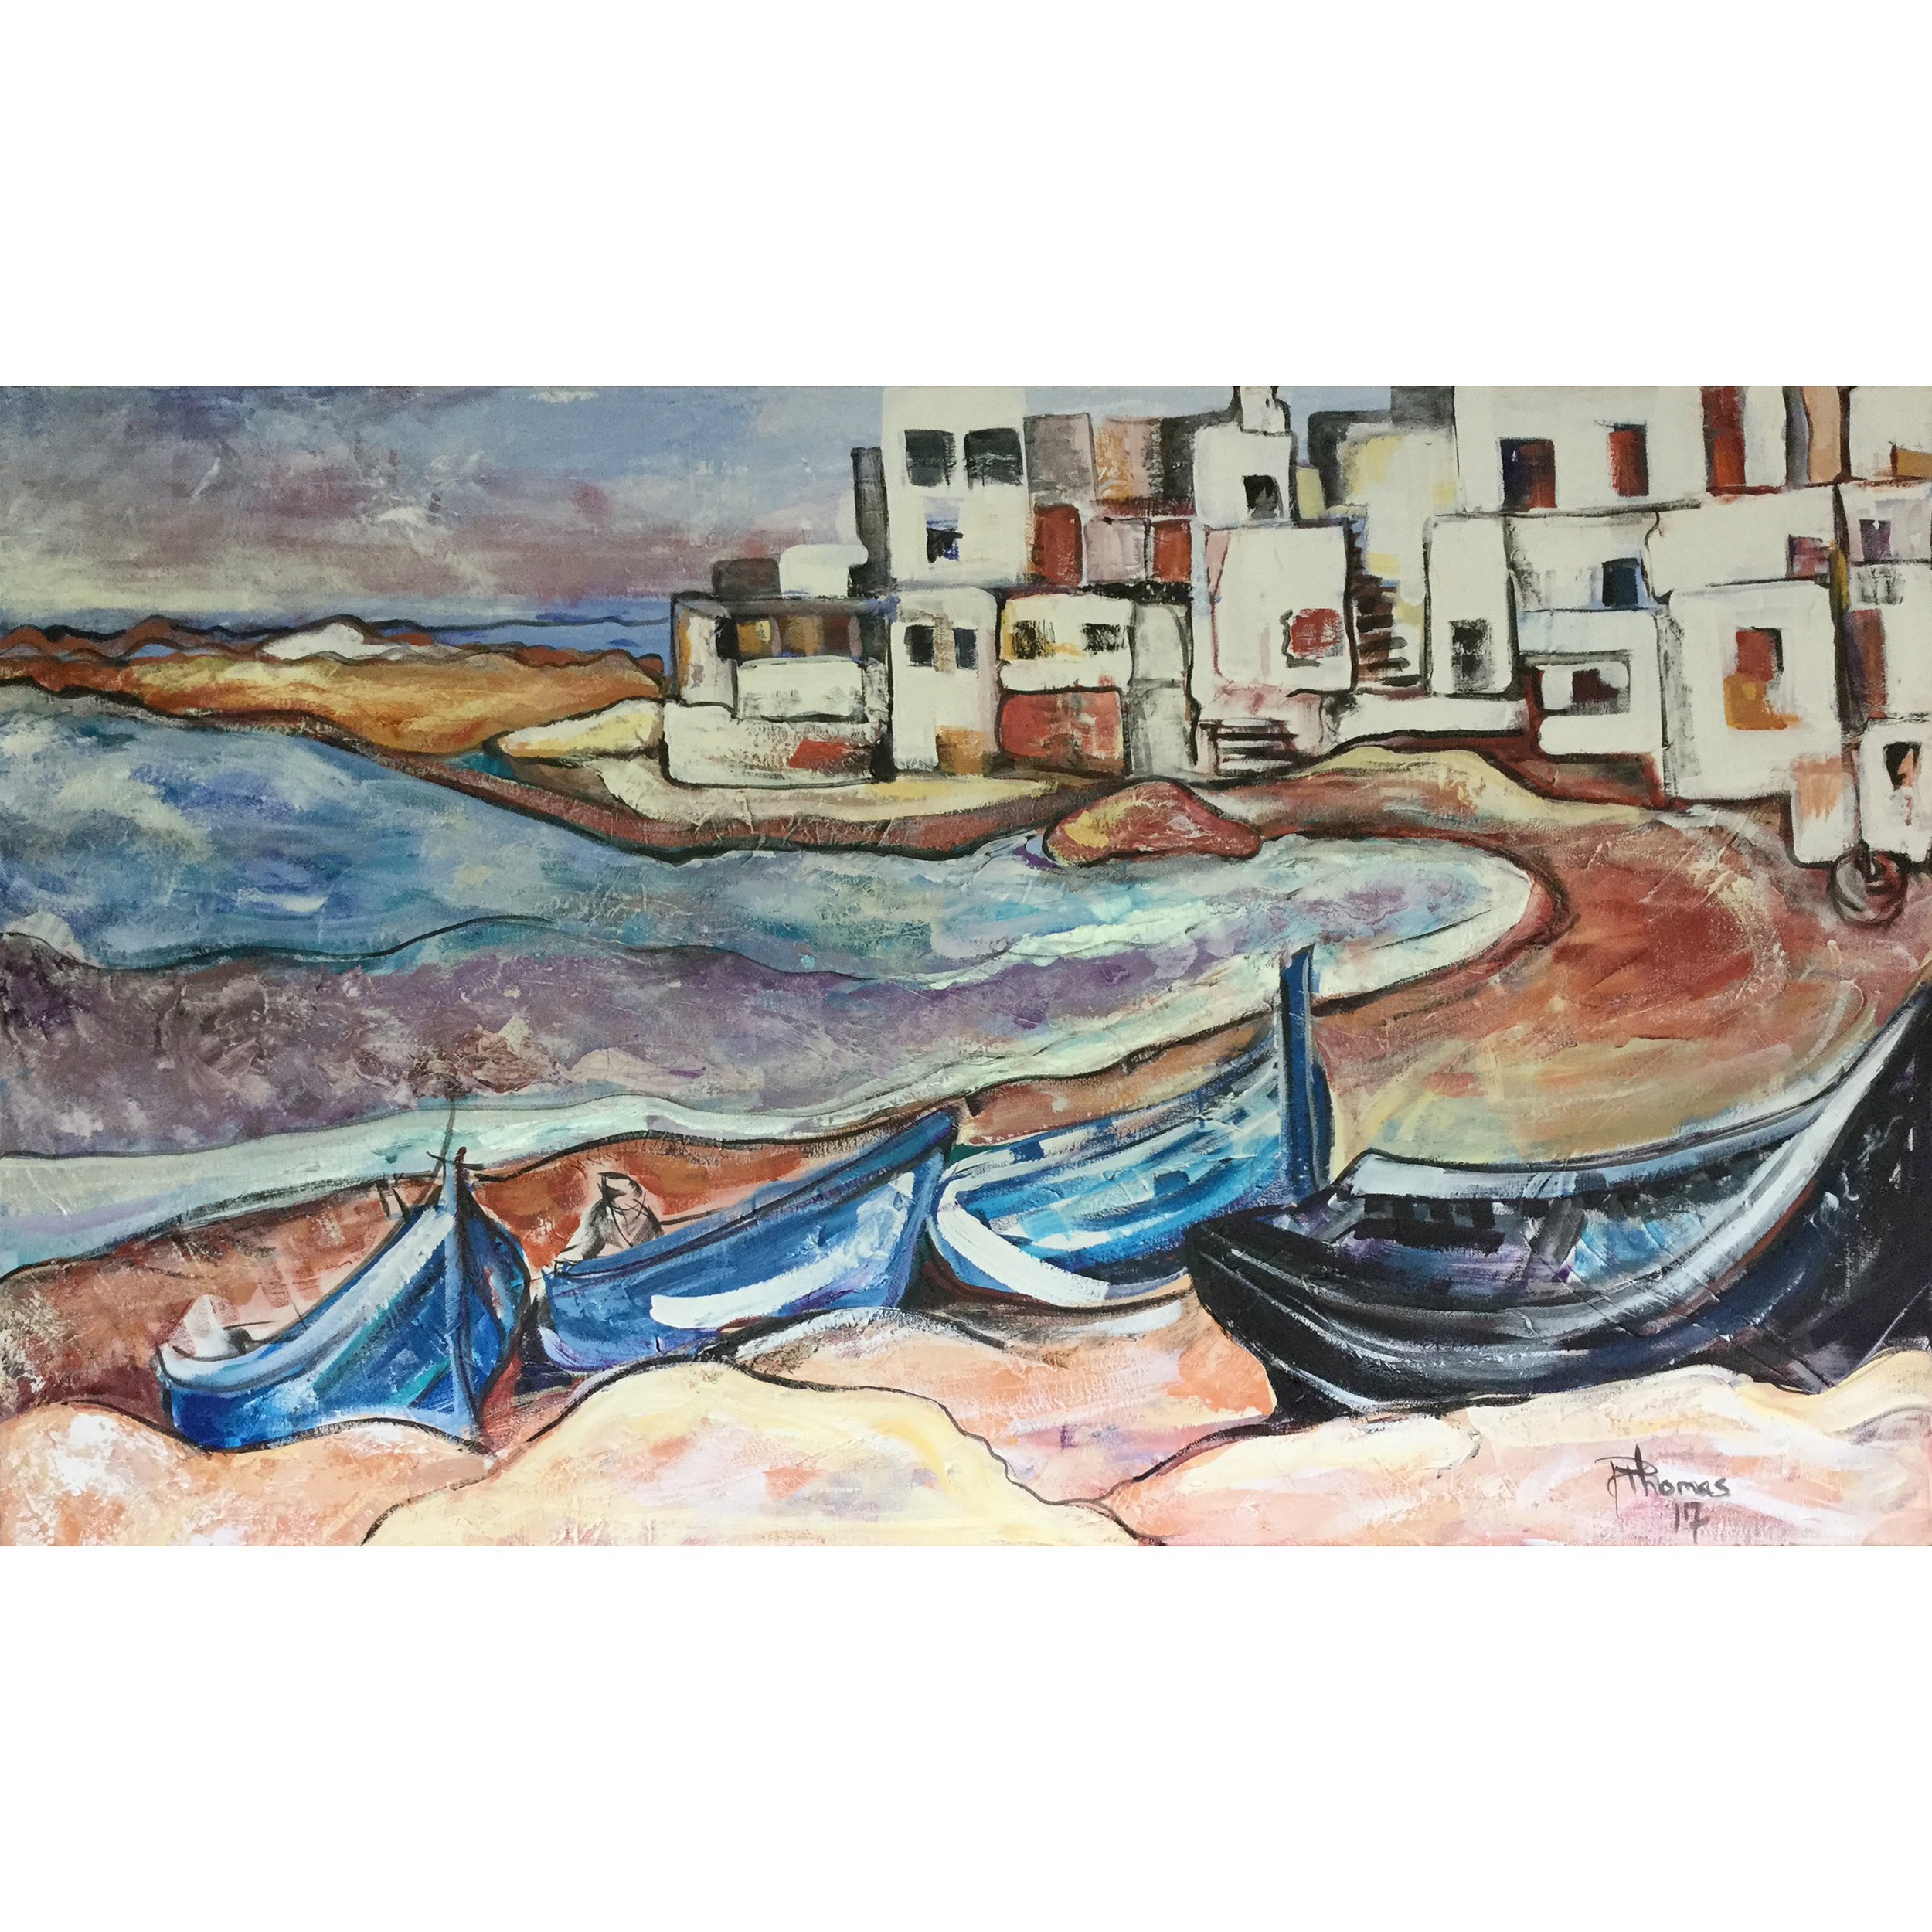 Morocco Fishing Village2.jpg